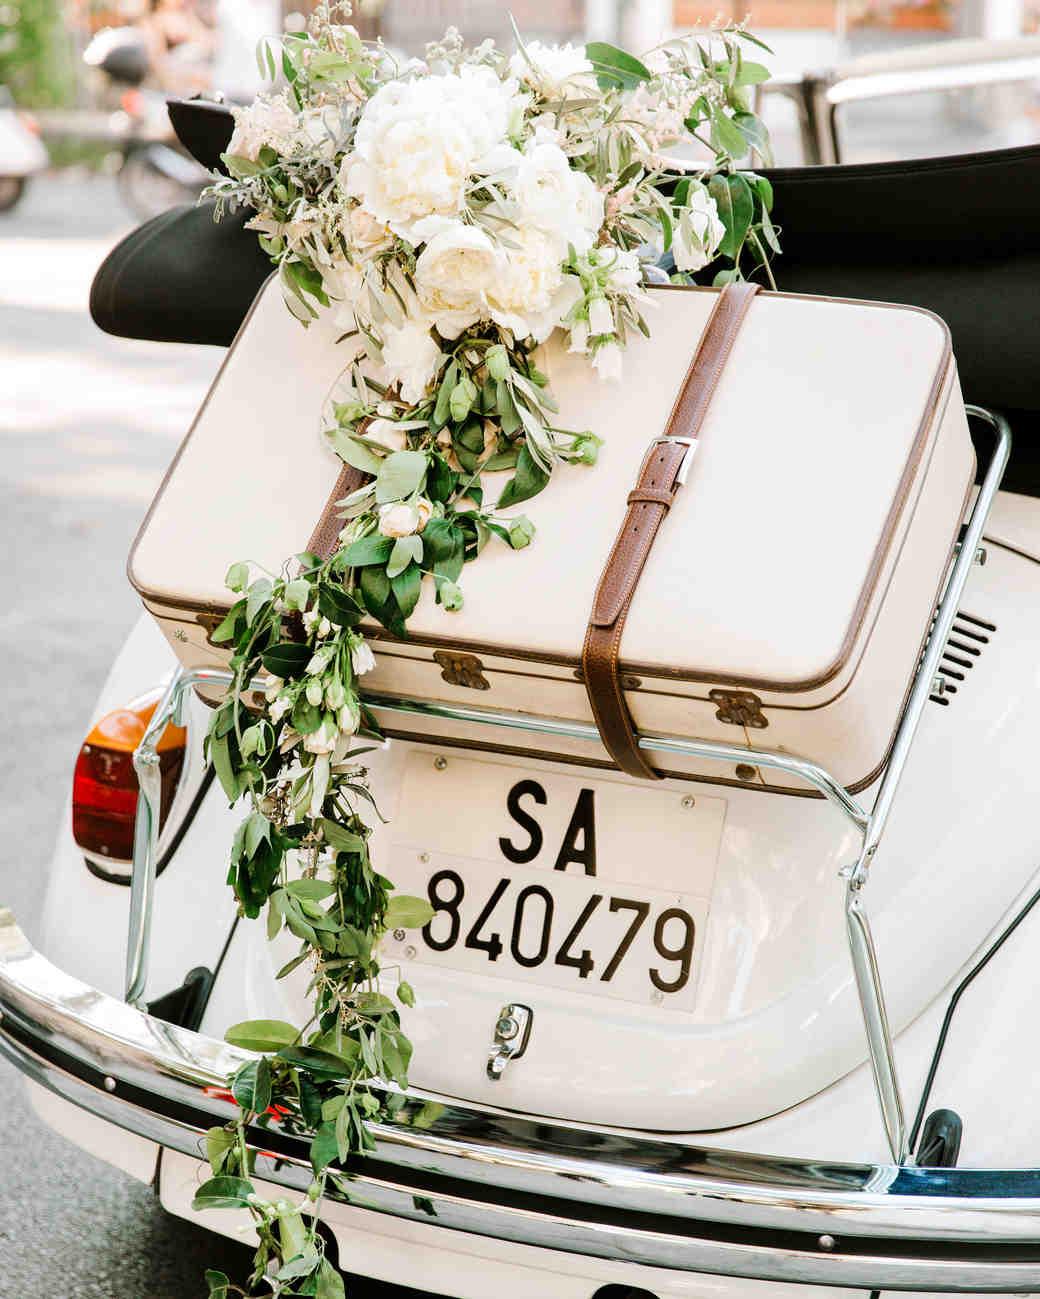 lisa-greg-italy-wedding-car-103312973_vert.jpg